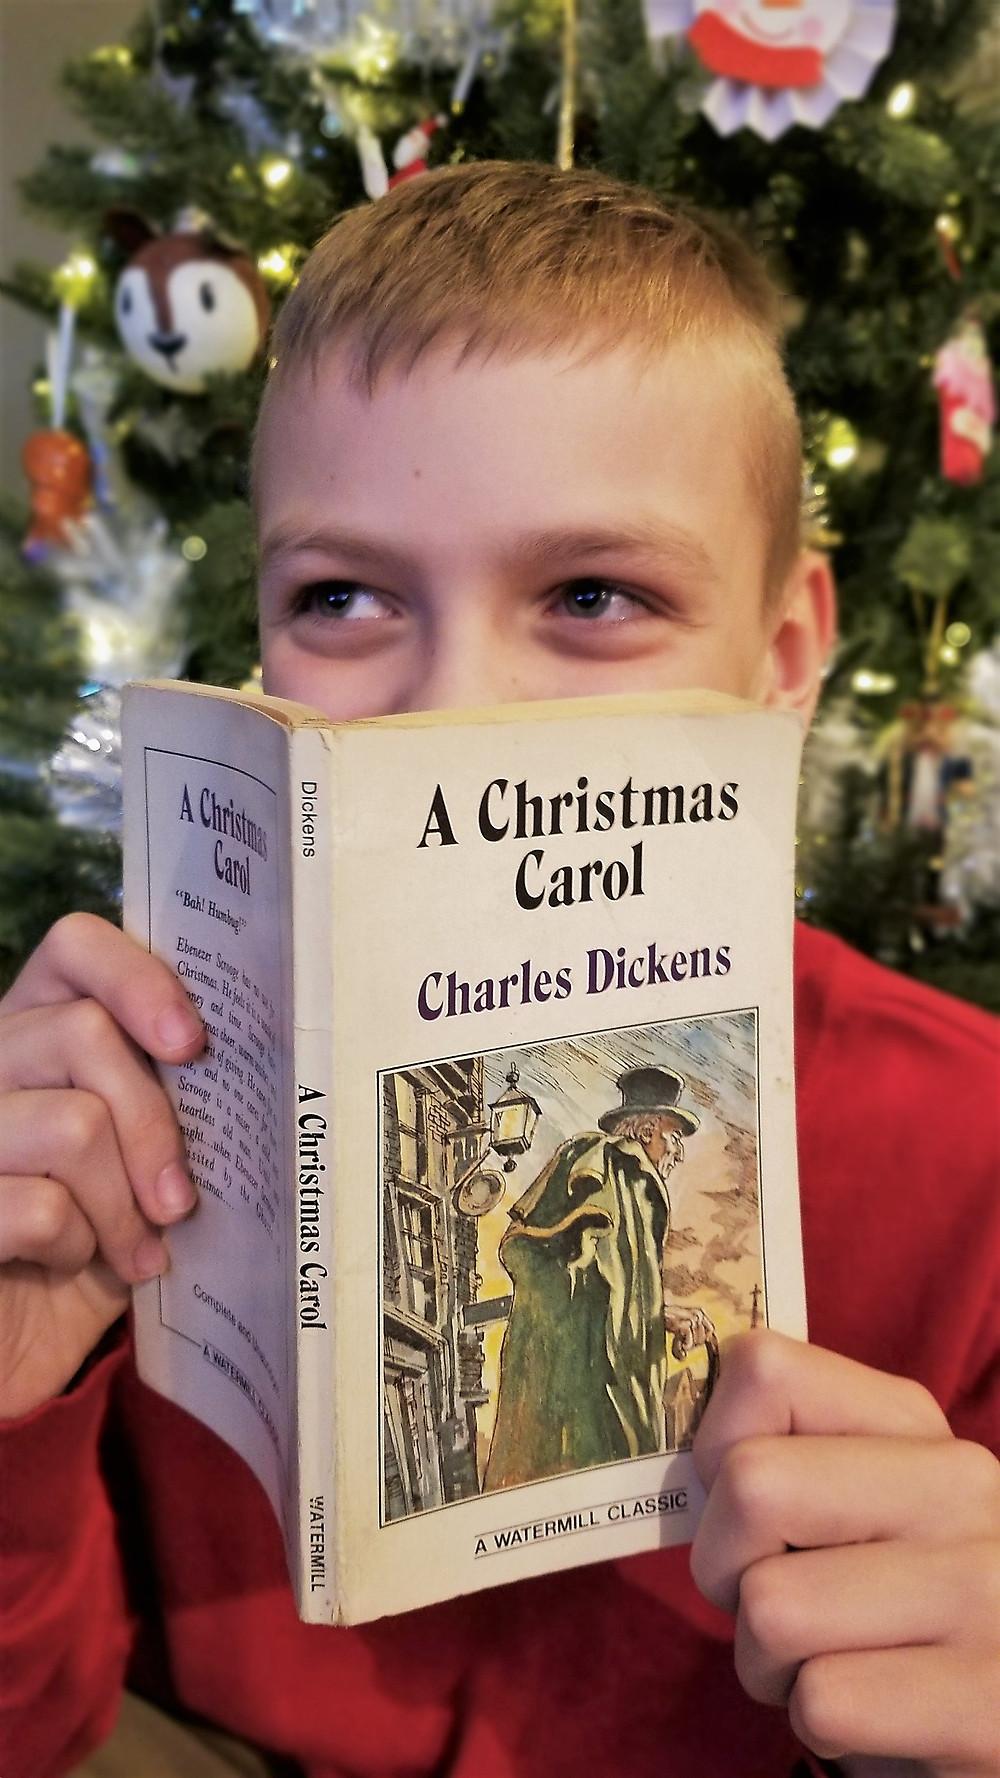 A Christmas Carol summary, Christmas Carol review, kid christmas books, middle school classic literature